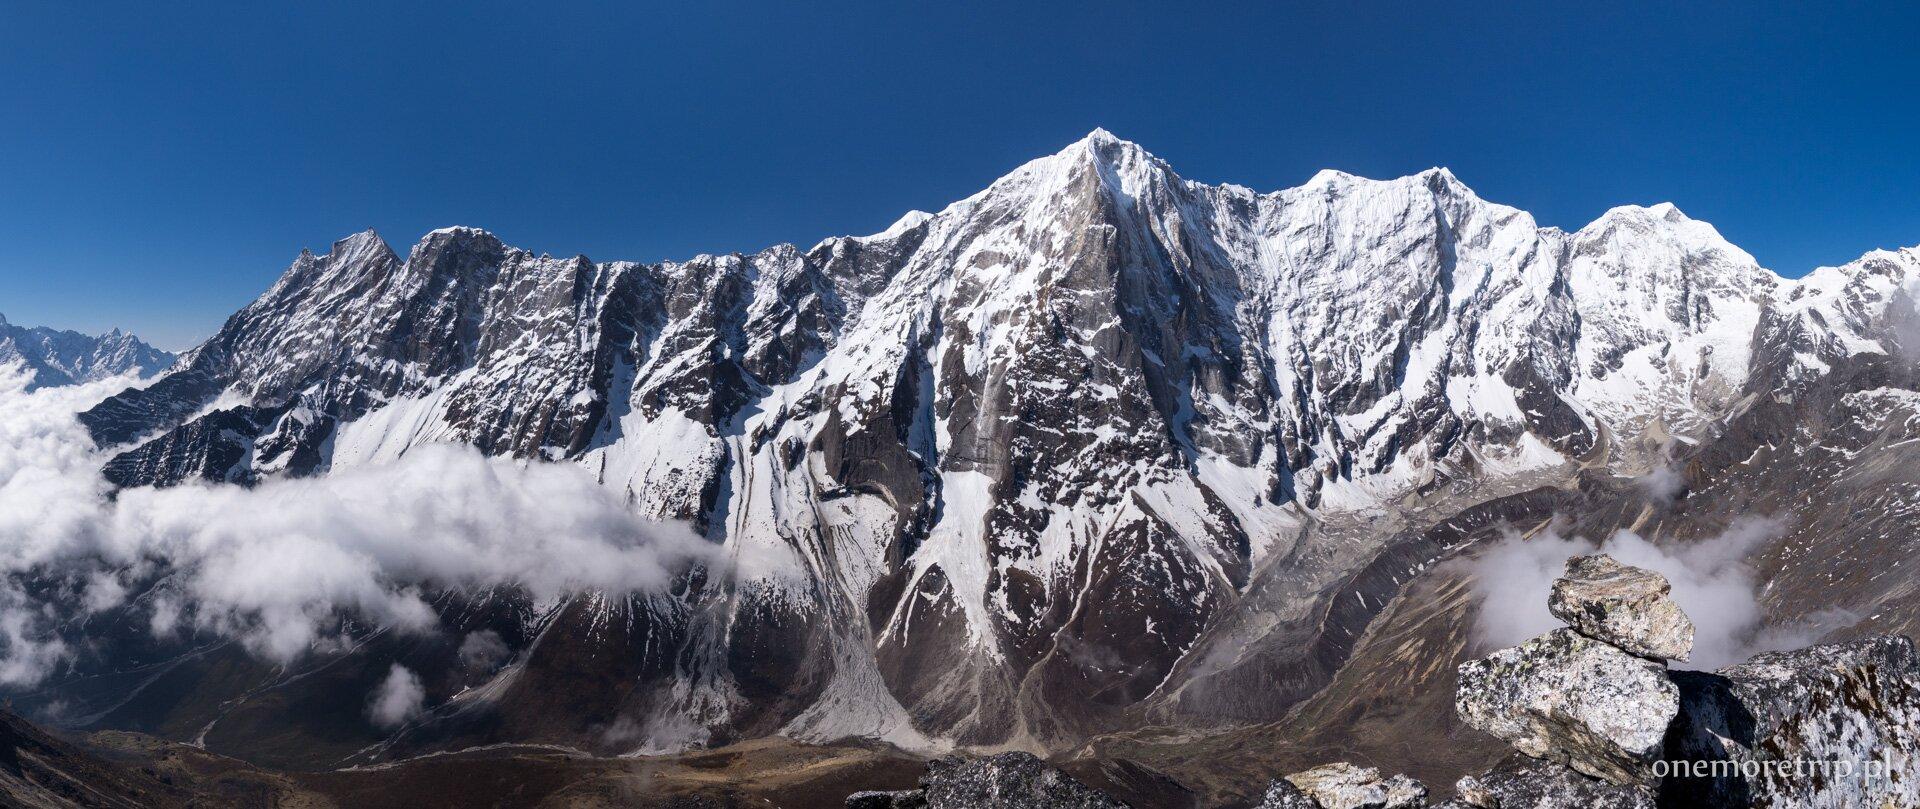 Sunder Peak